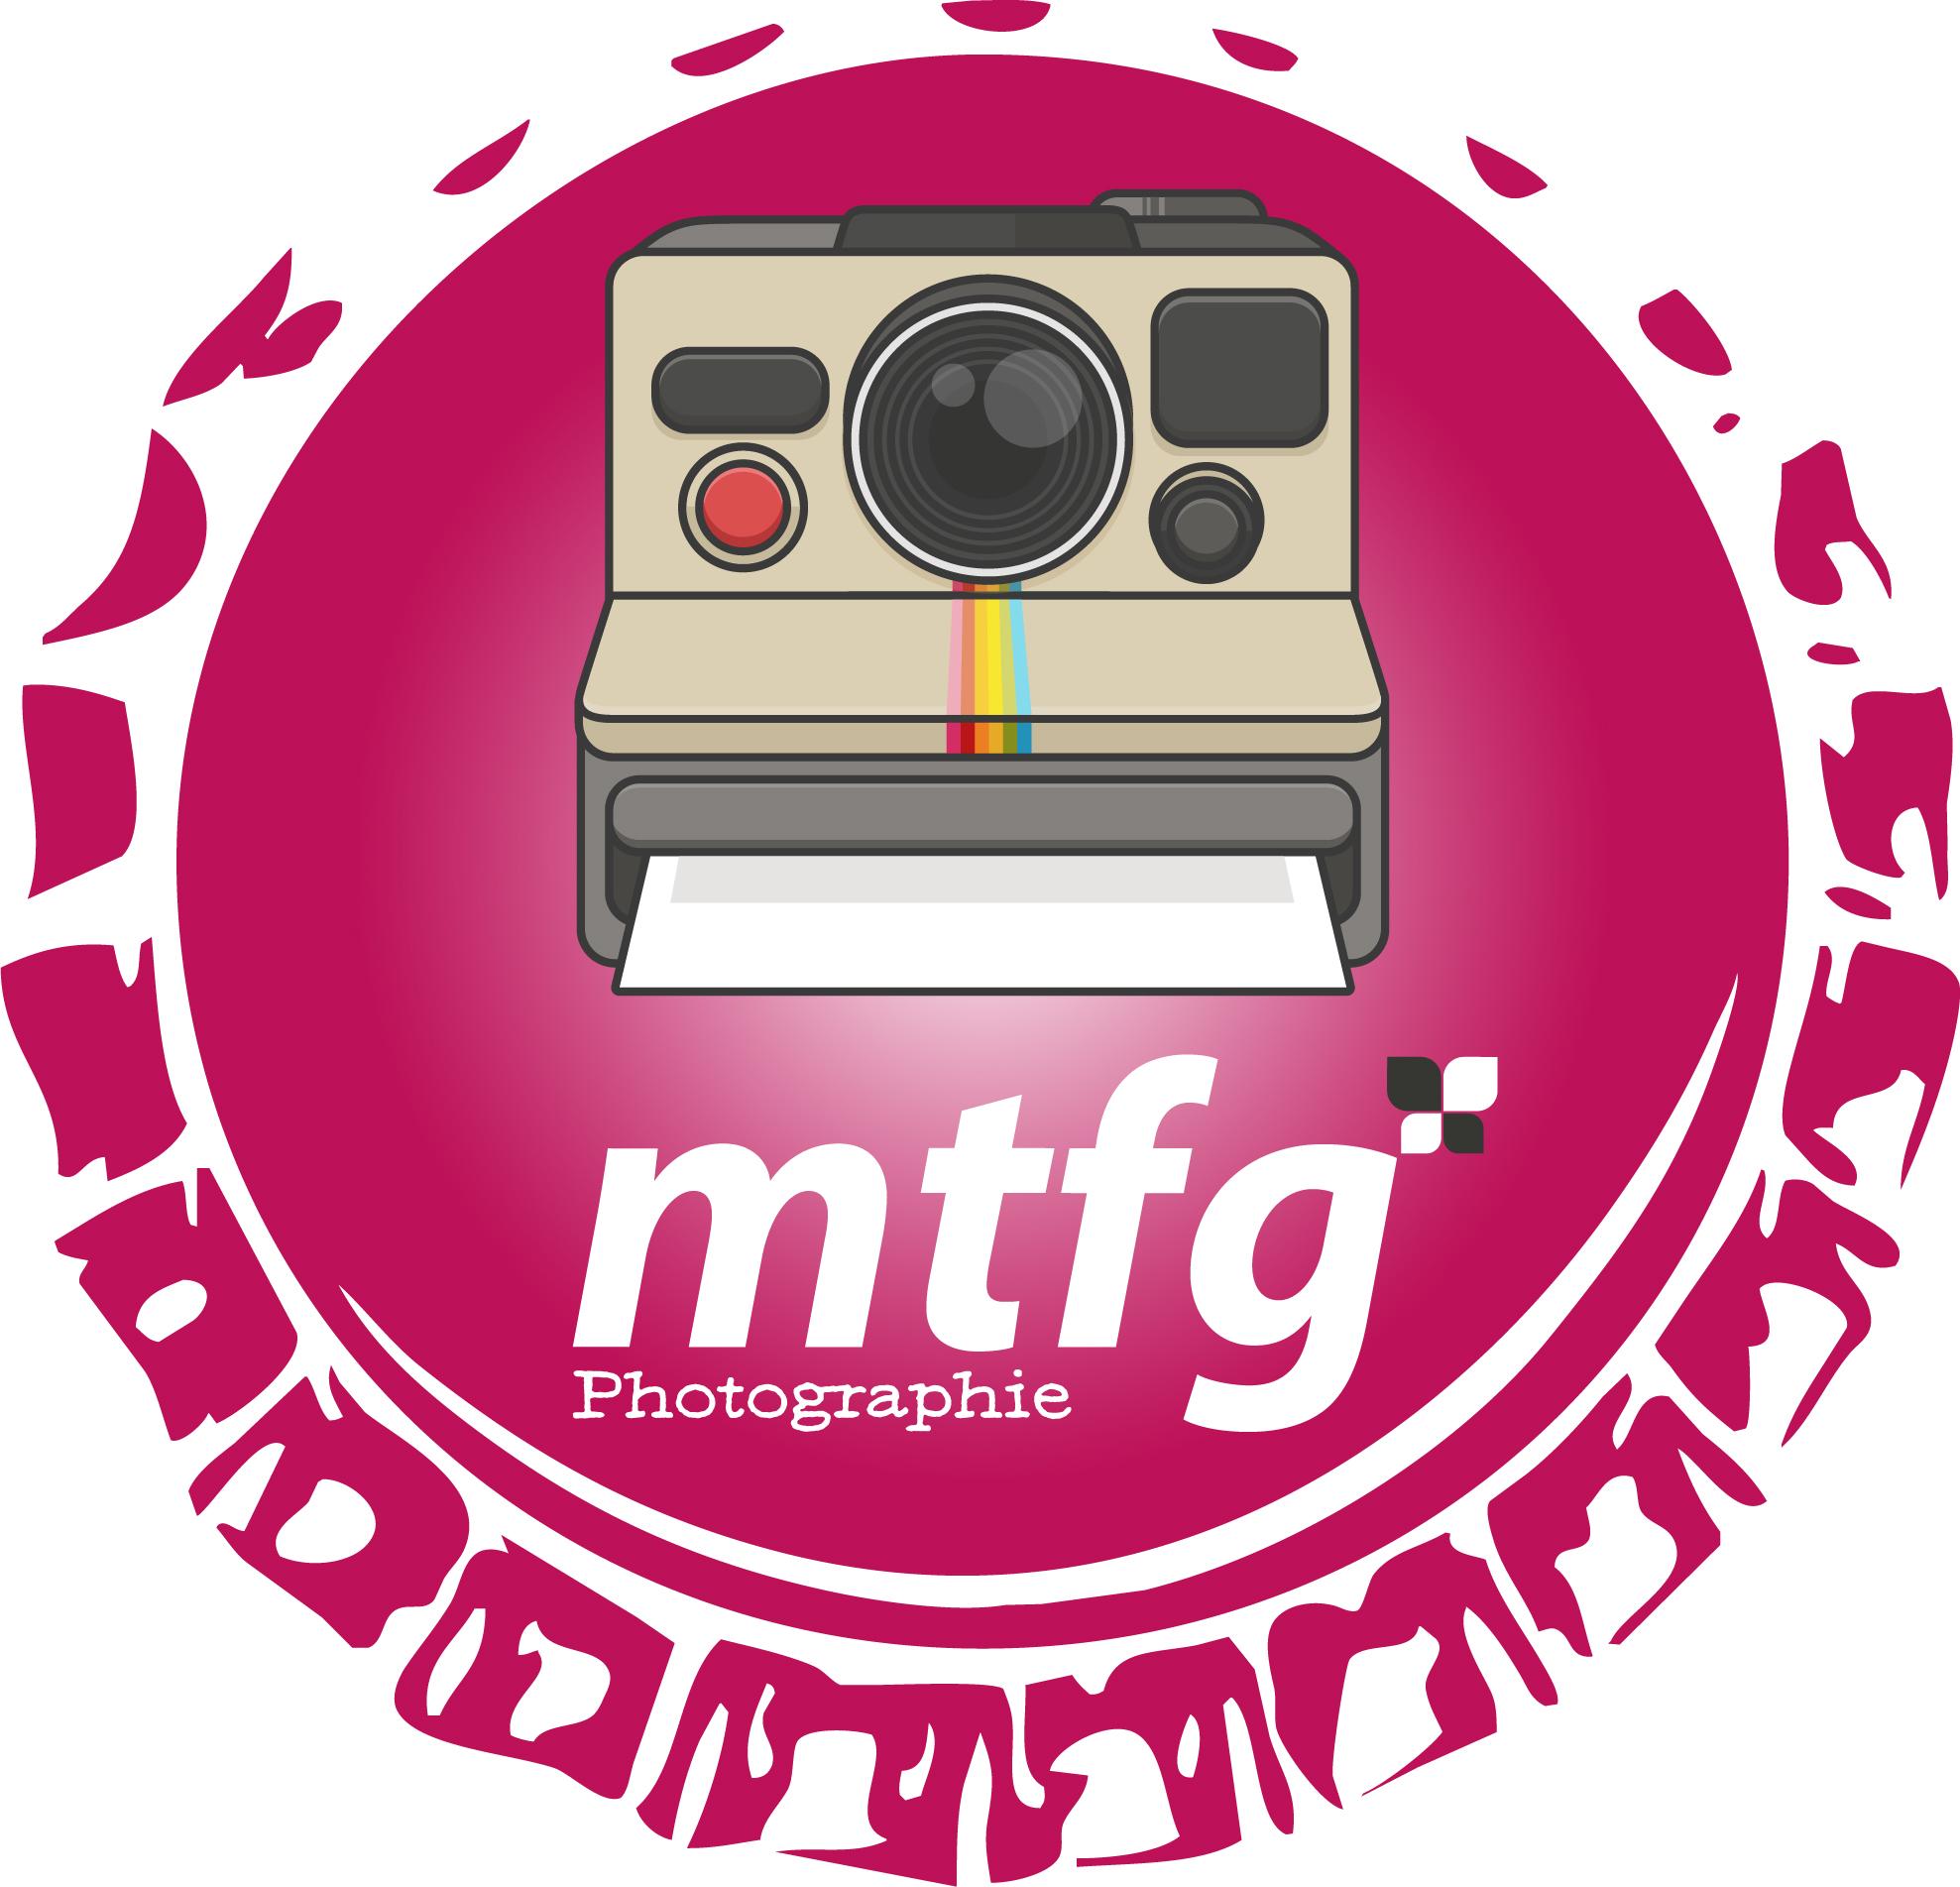 MTFG Photographie